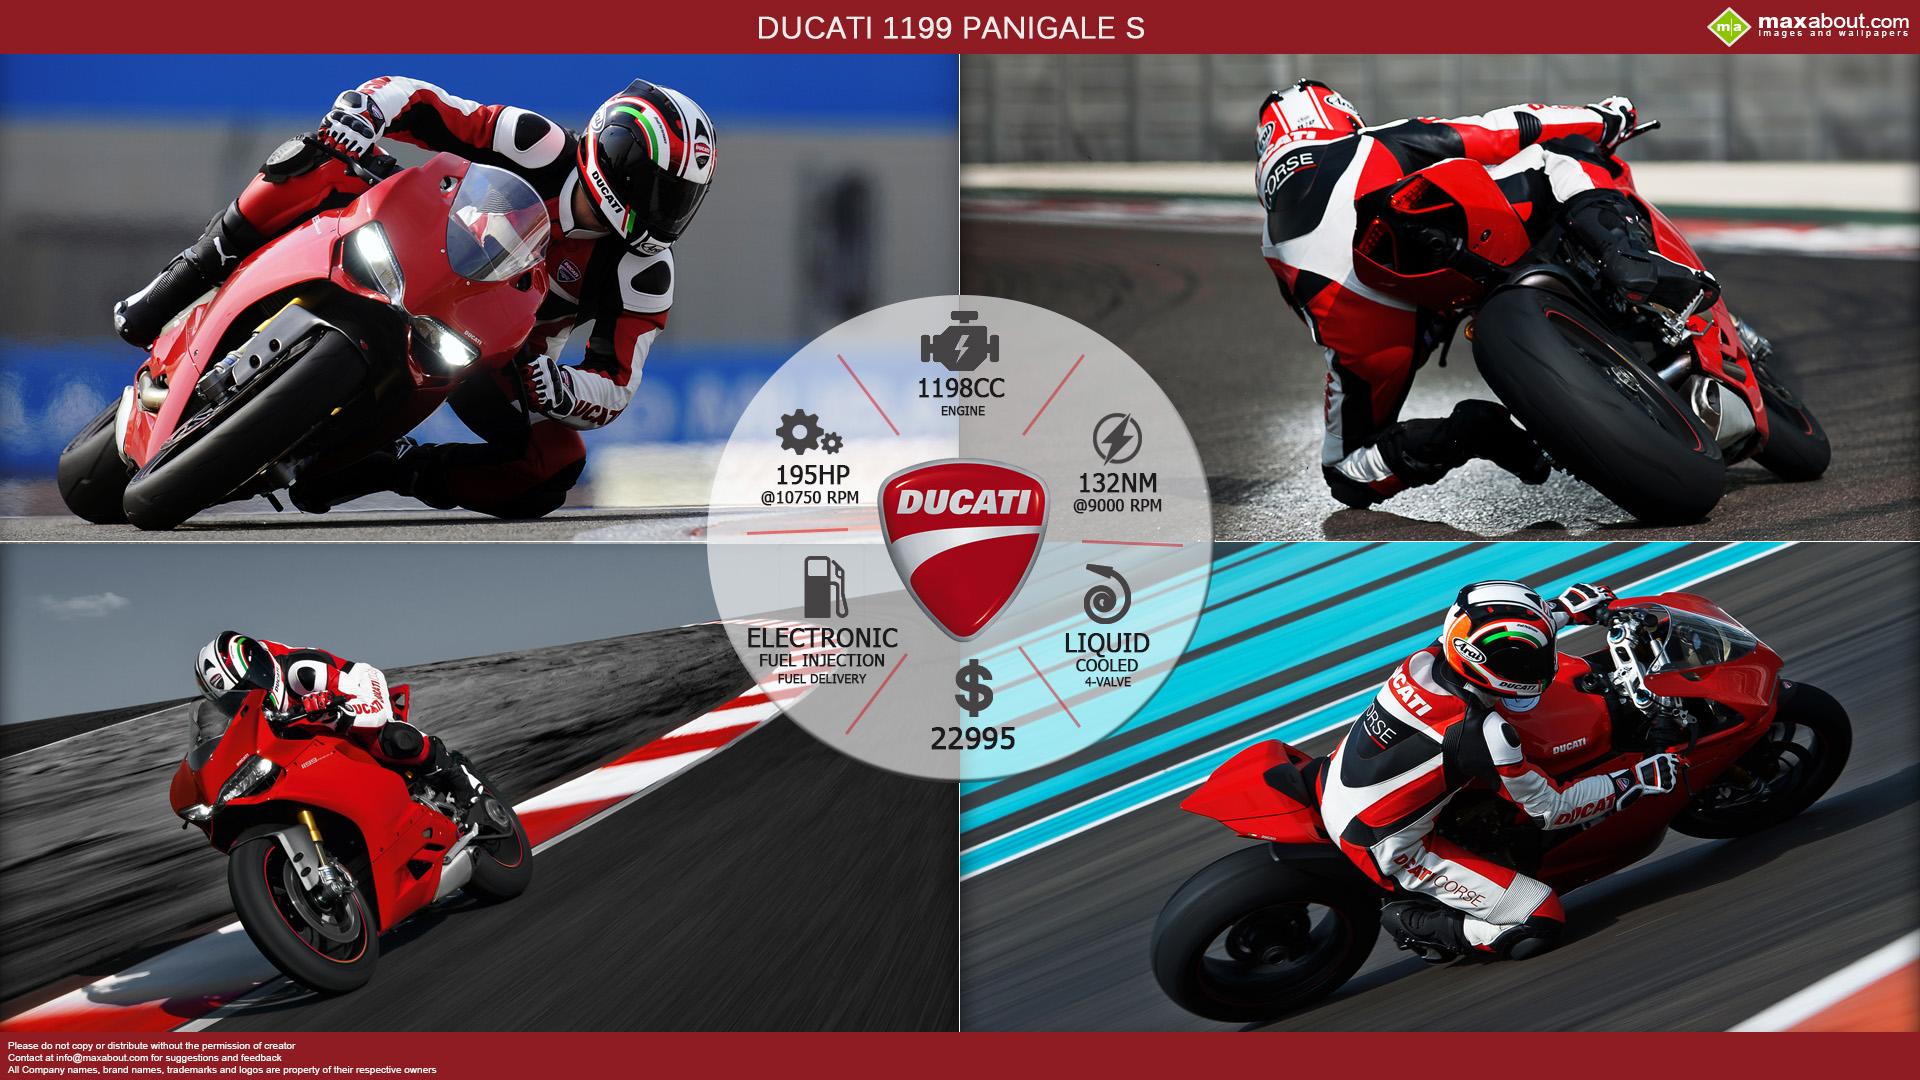 usbikesducatiducati wallpapers2014 Ducati 1199 Panigale Sjpg 1920x1080